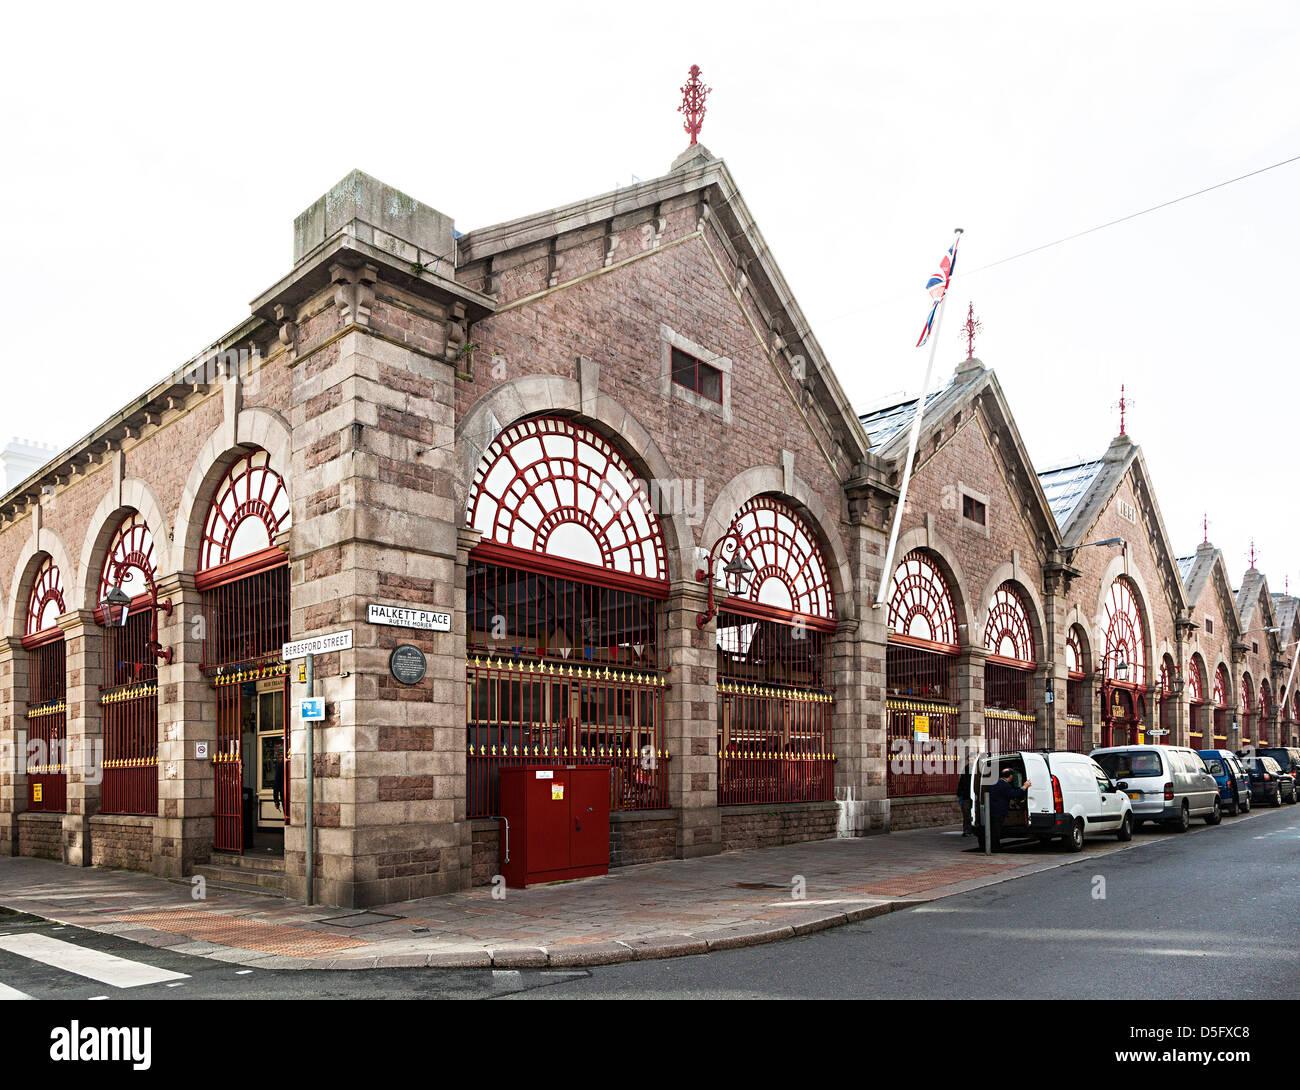 Central Market, St Helier, Jersey, Channel Islands, UK - Stock Image